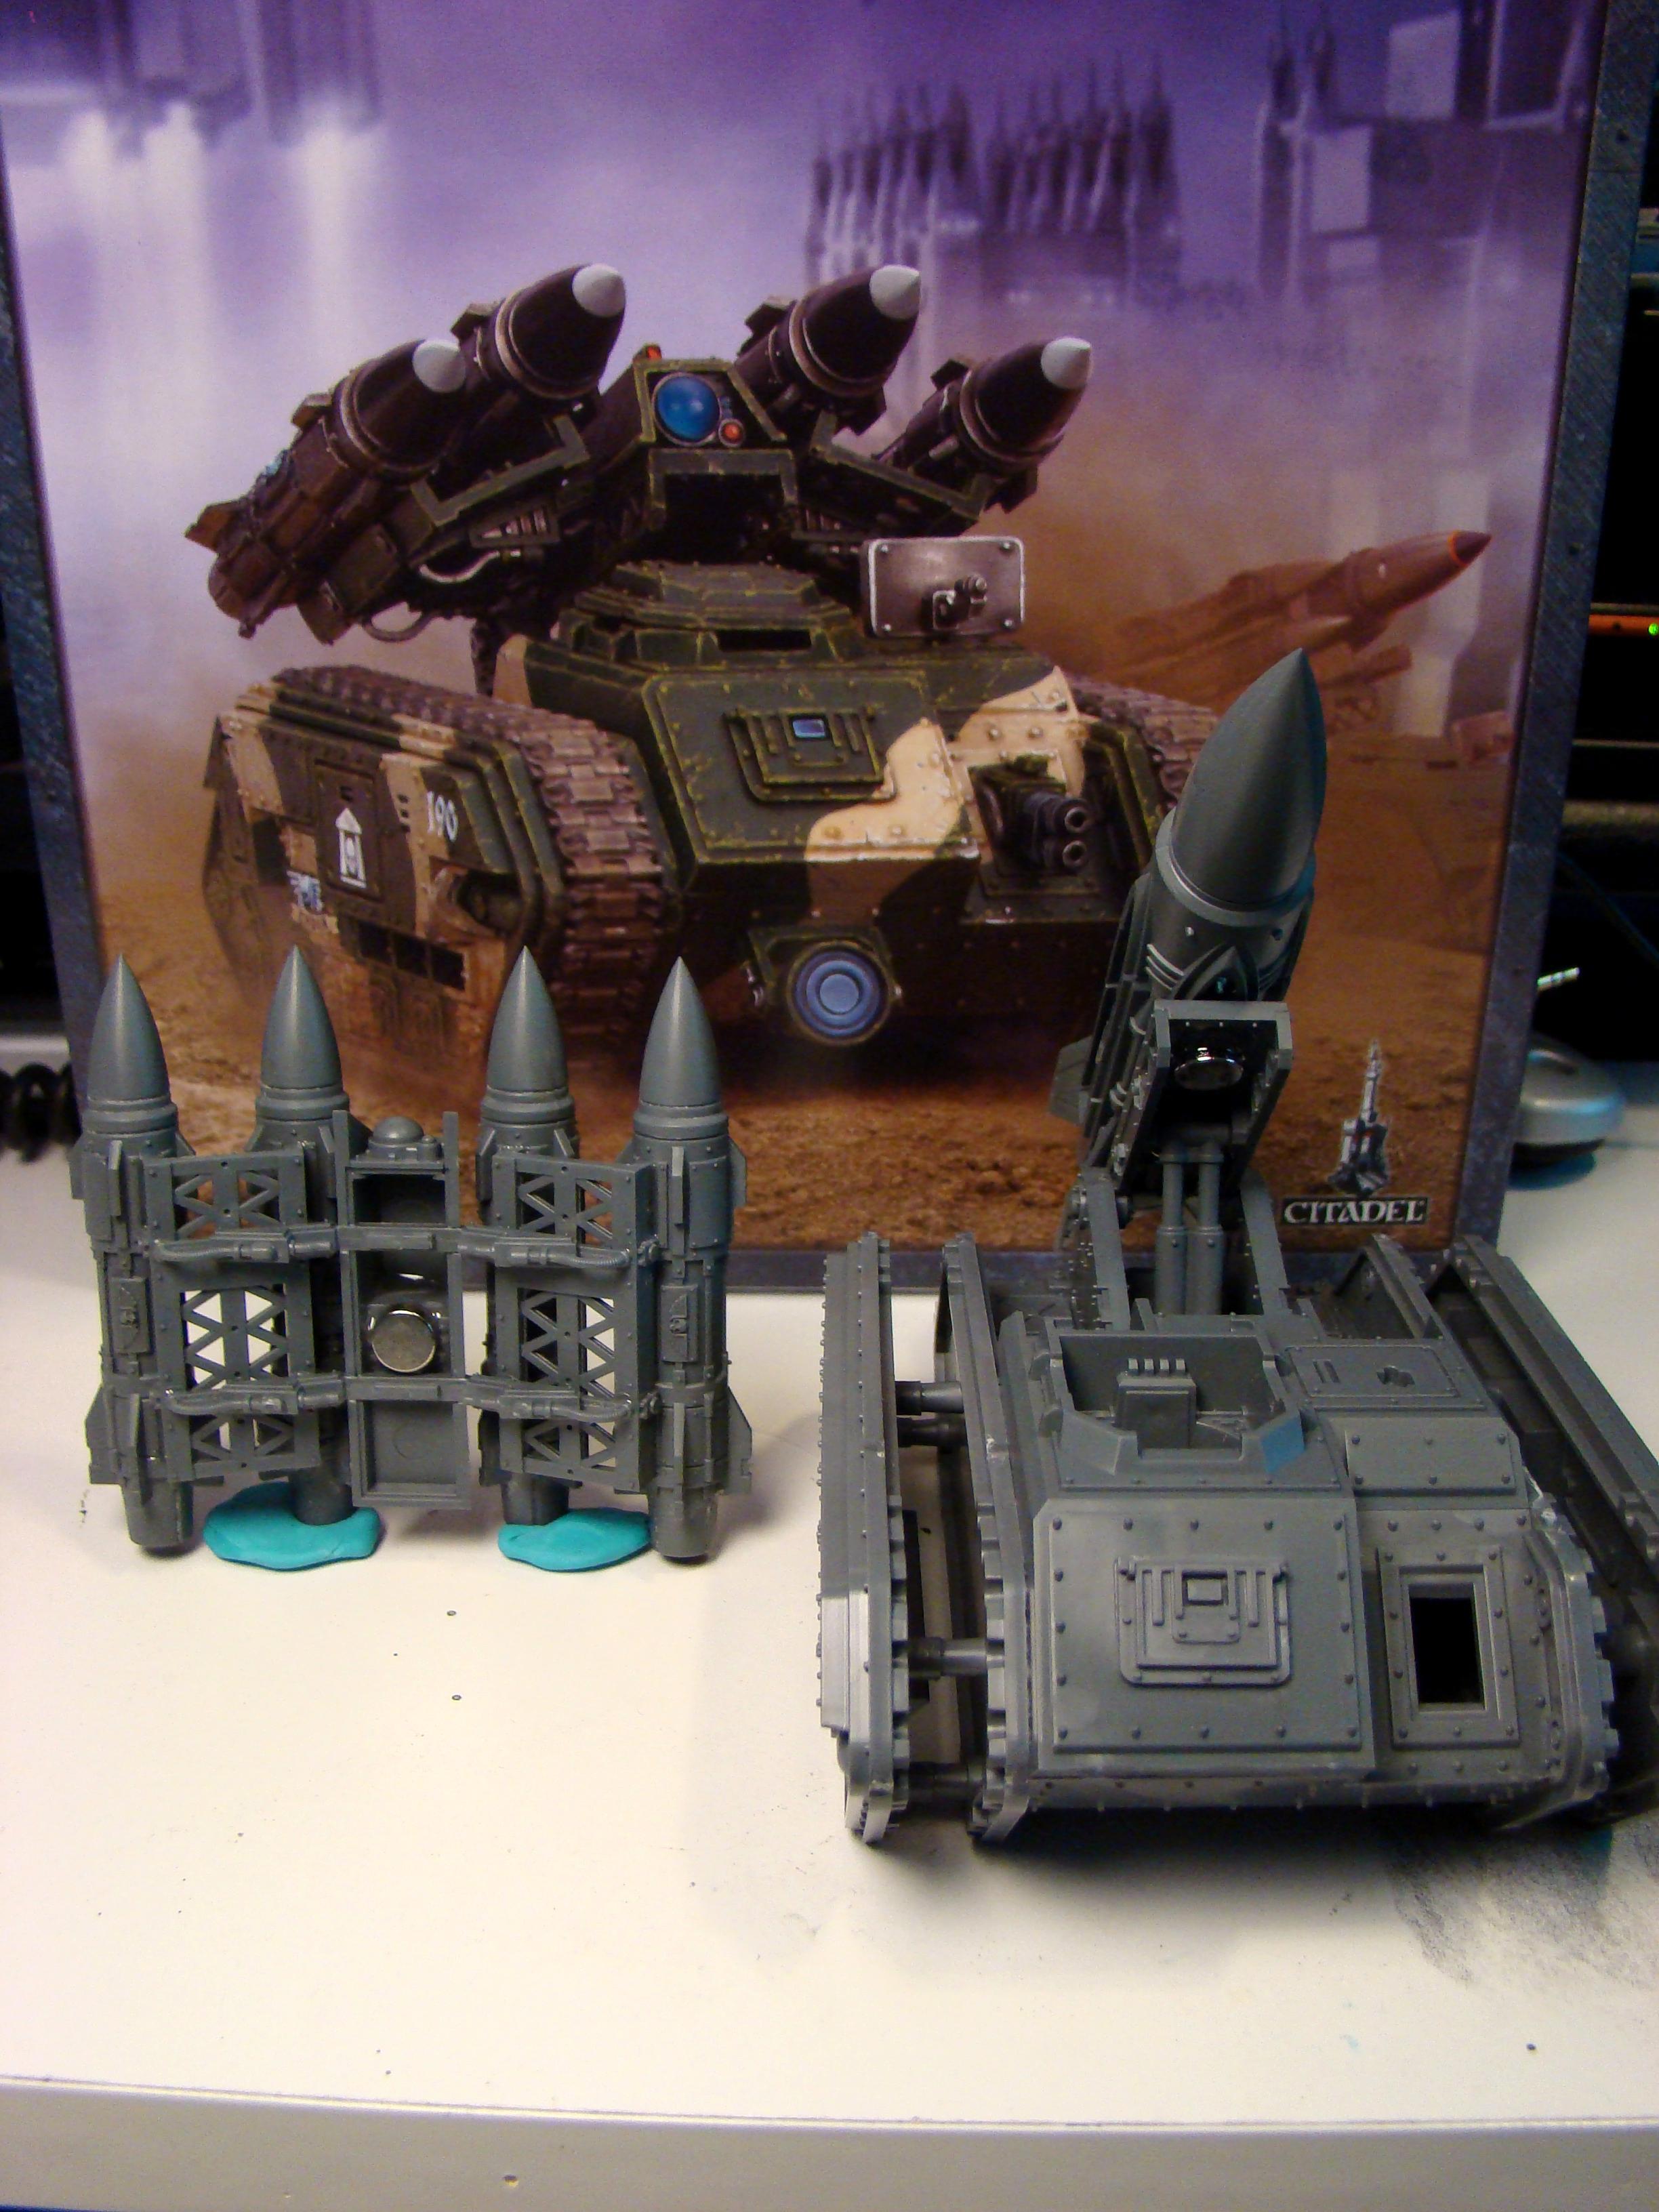 Deathstrike, Imperial Guard, Magnet, Magnetize, Mangets, Manticore, Missile Launcher, Tank, Warhammer 40,000, Warhammer Fantasy